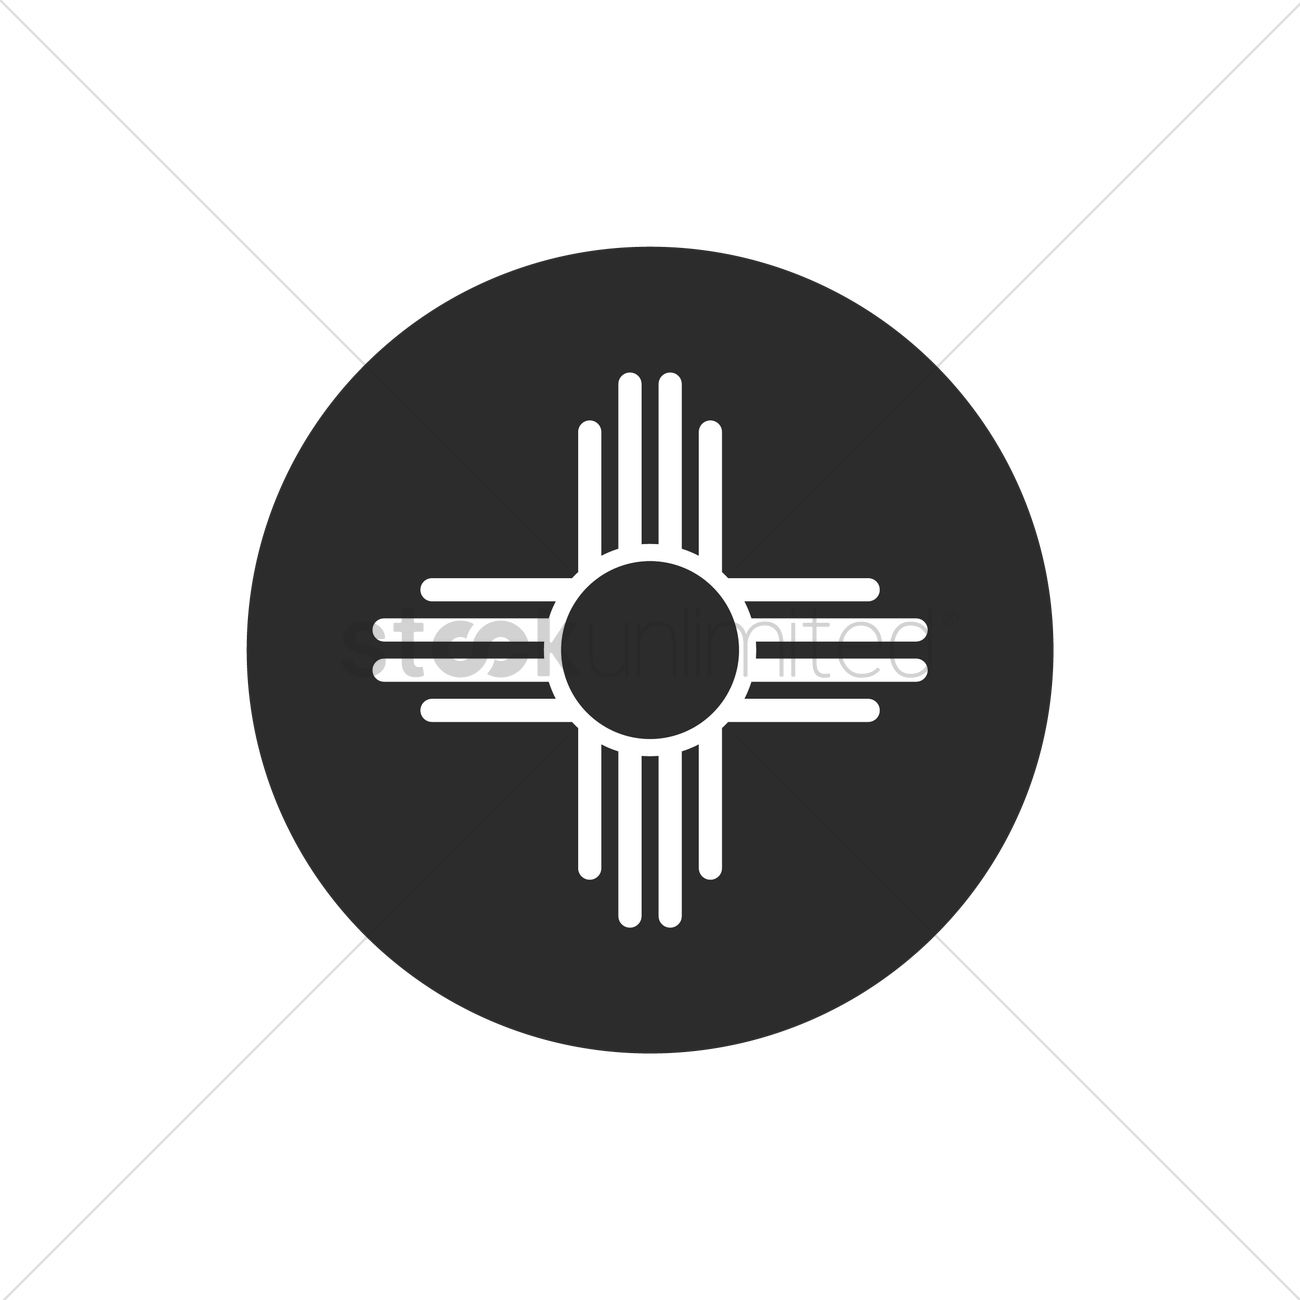 Zia symbol Vector Image - 1617461 | StockUnlimited